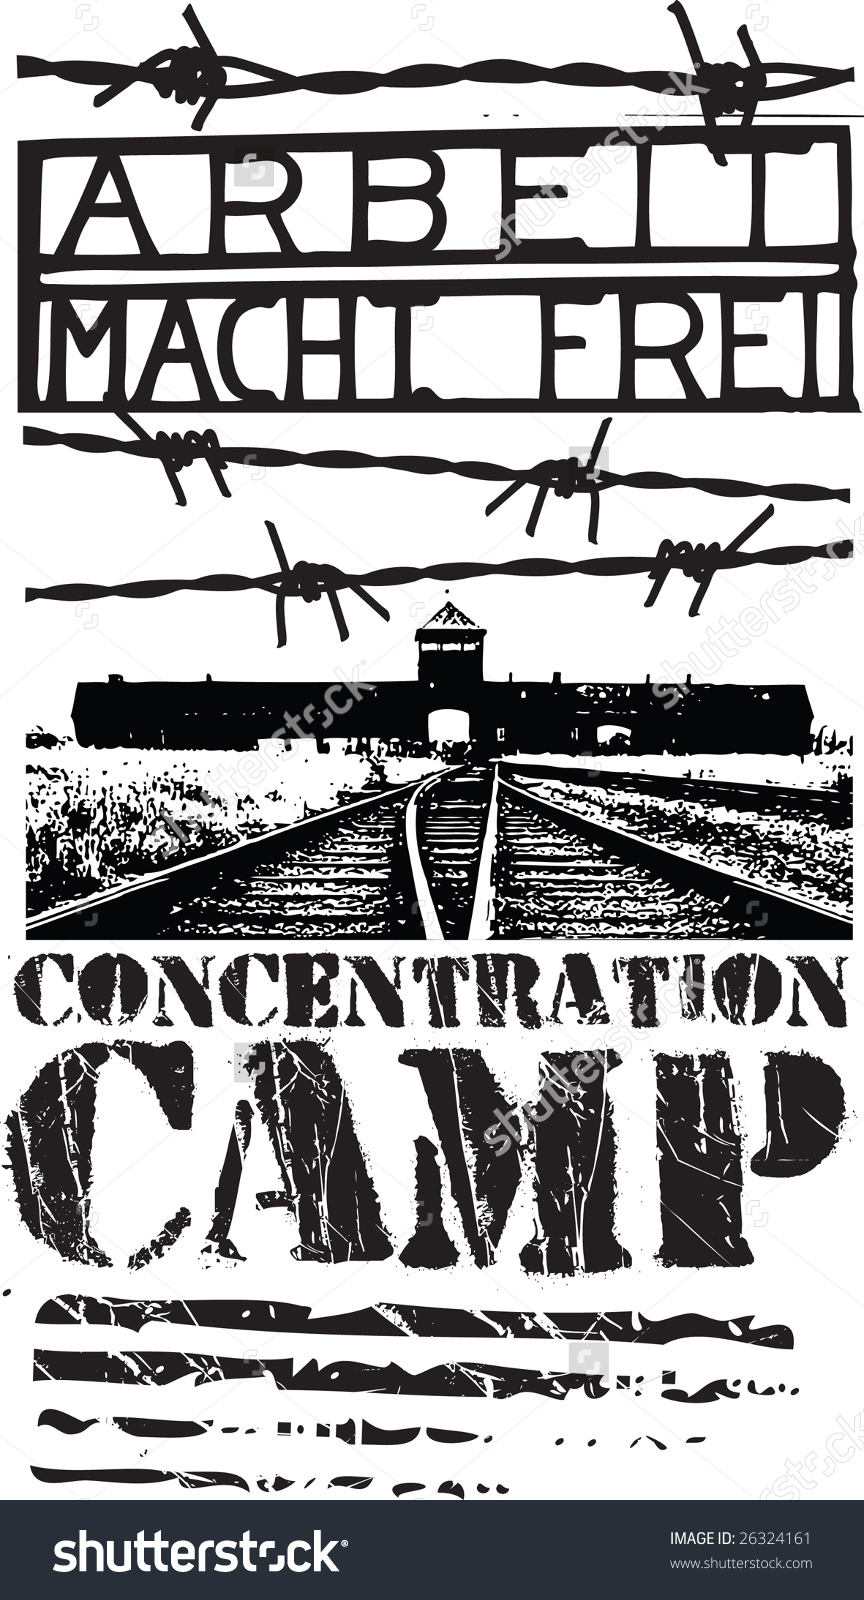 Concentration Camp Design Stock Vector Illustration 26324161.